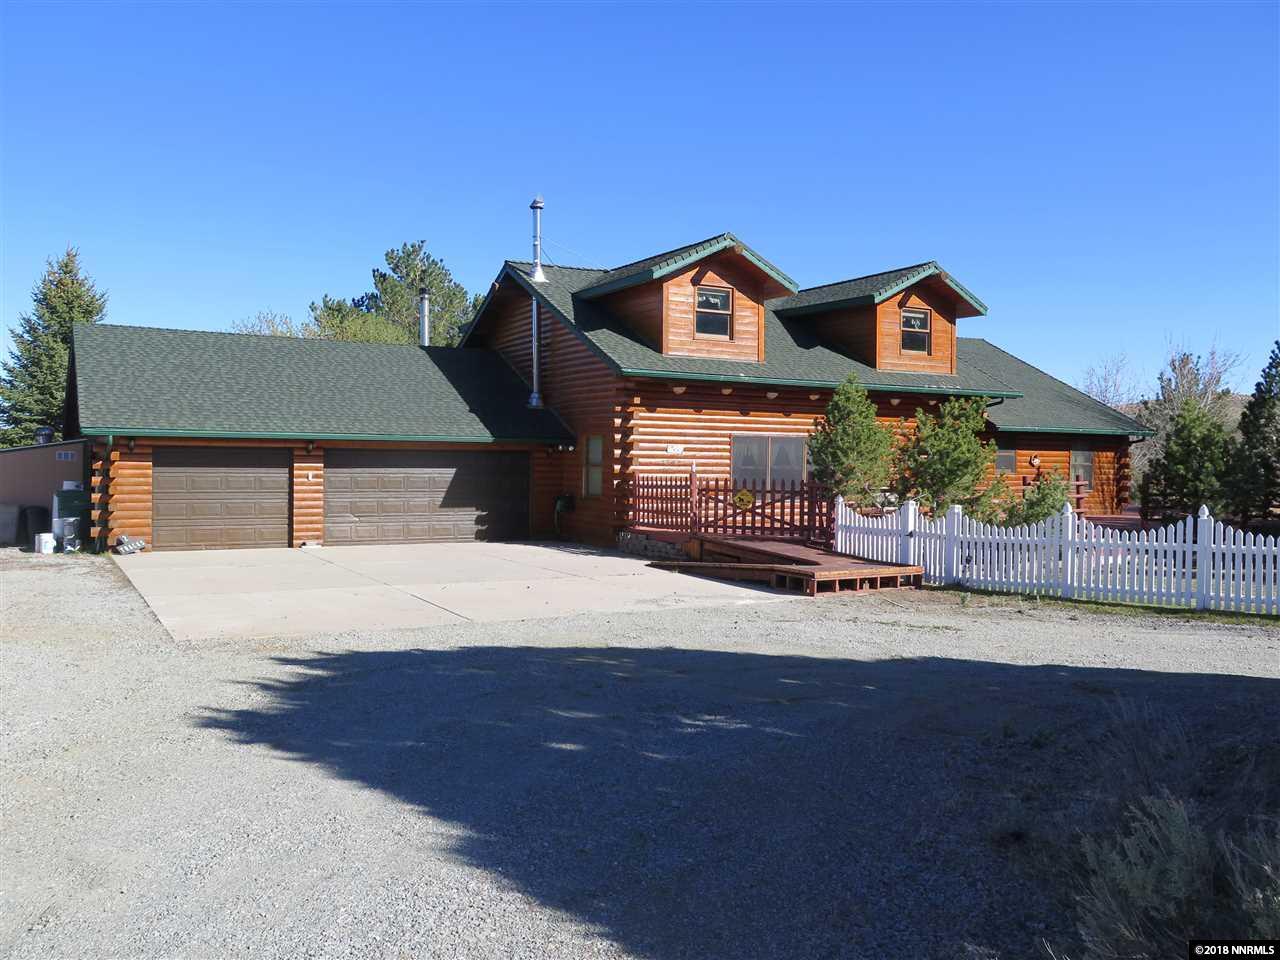 Image for 1390 Half Mine, Reno, NV 89506